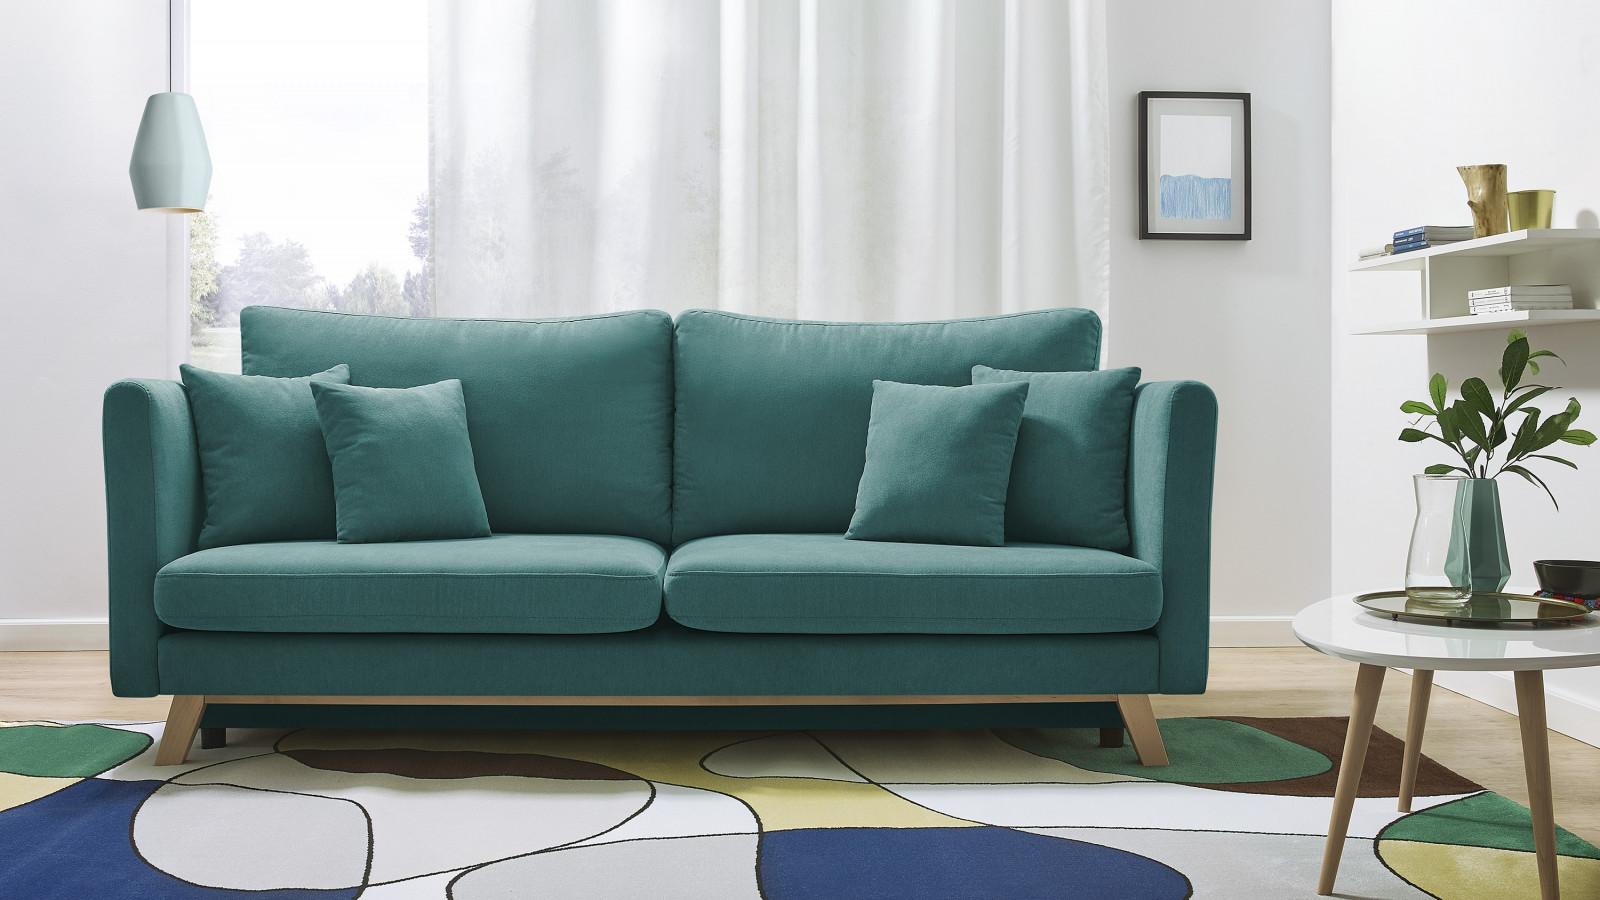 Sofa triplo convertible